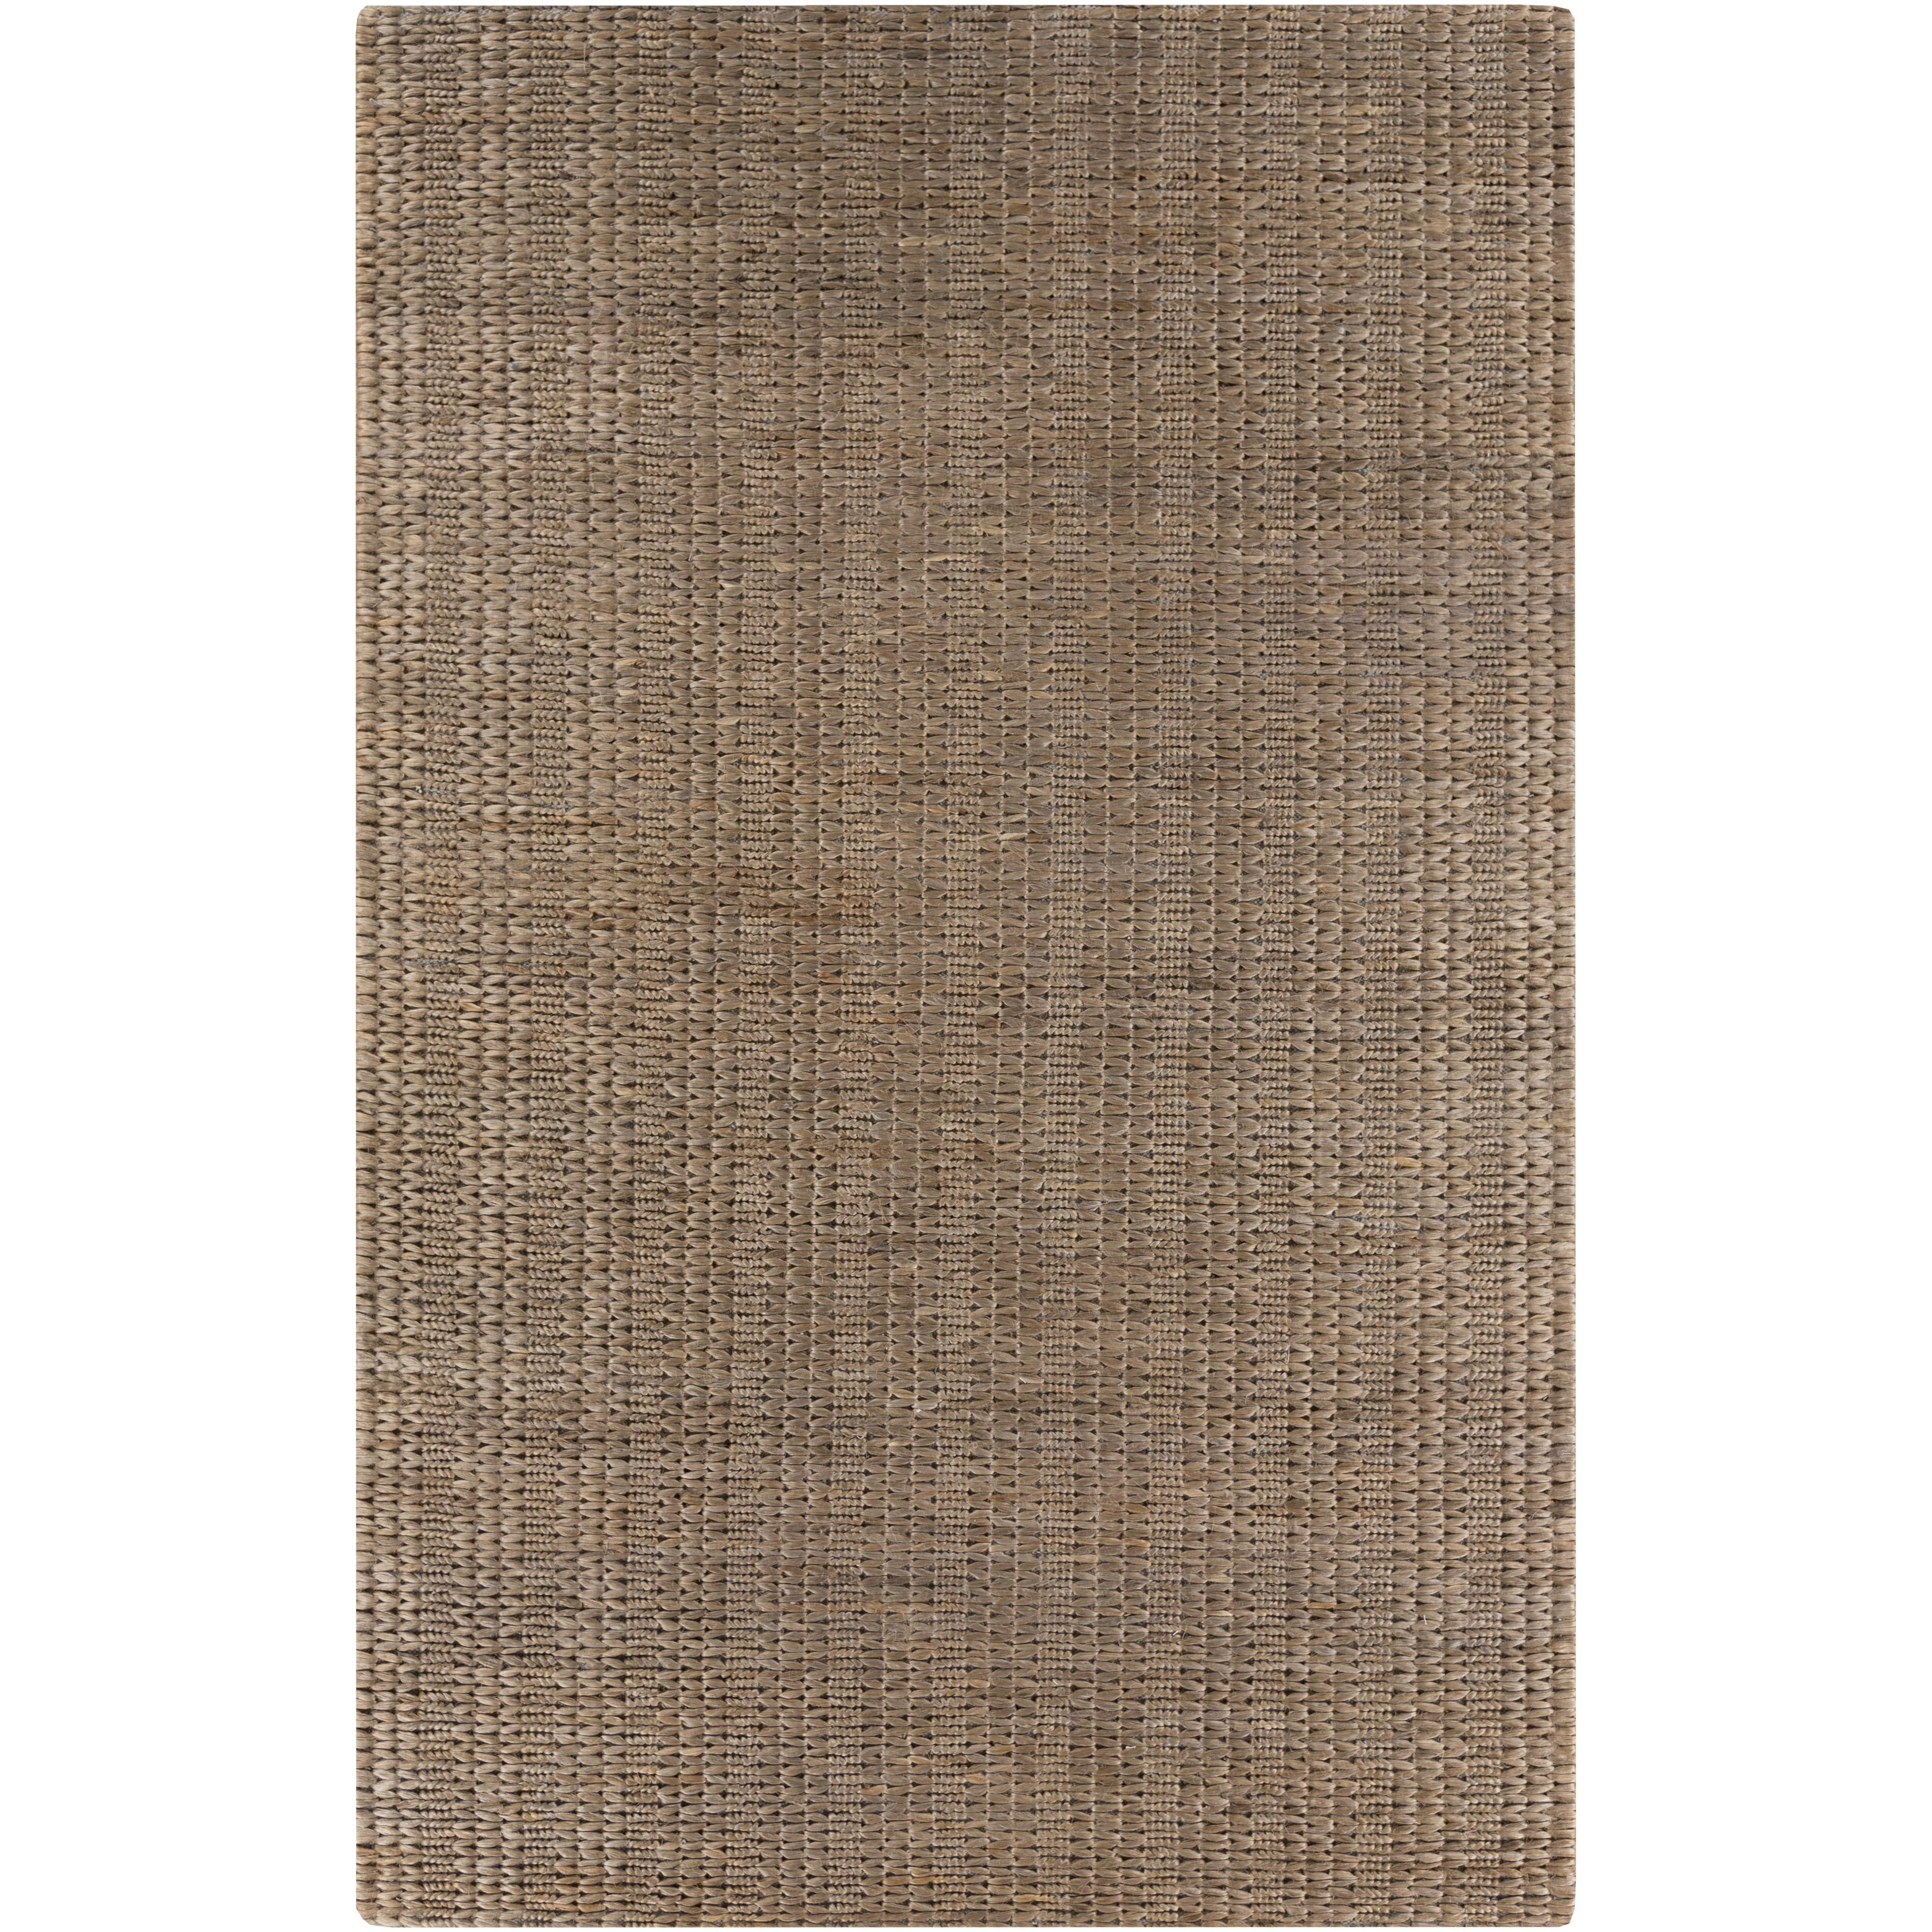 Surya Rugs Tropics 5' x 8' - Item Number: TRO1022-58